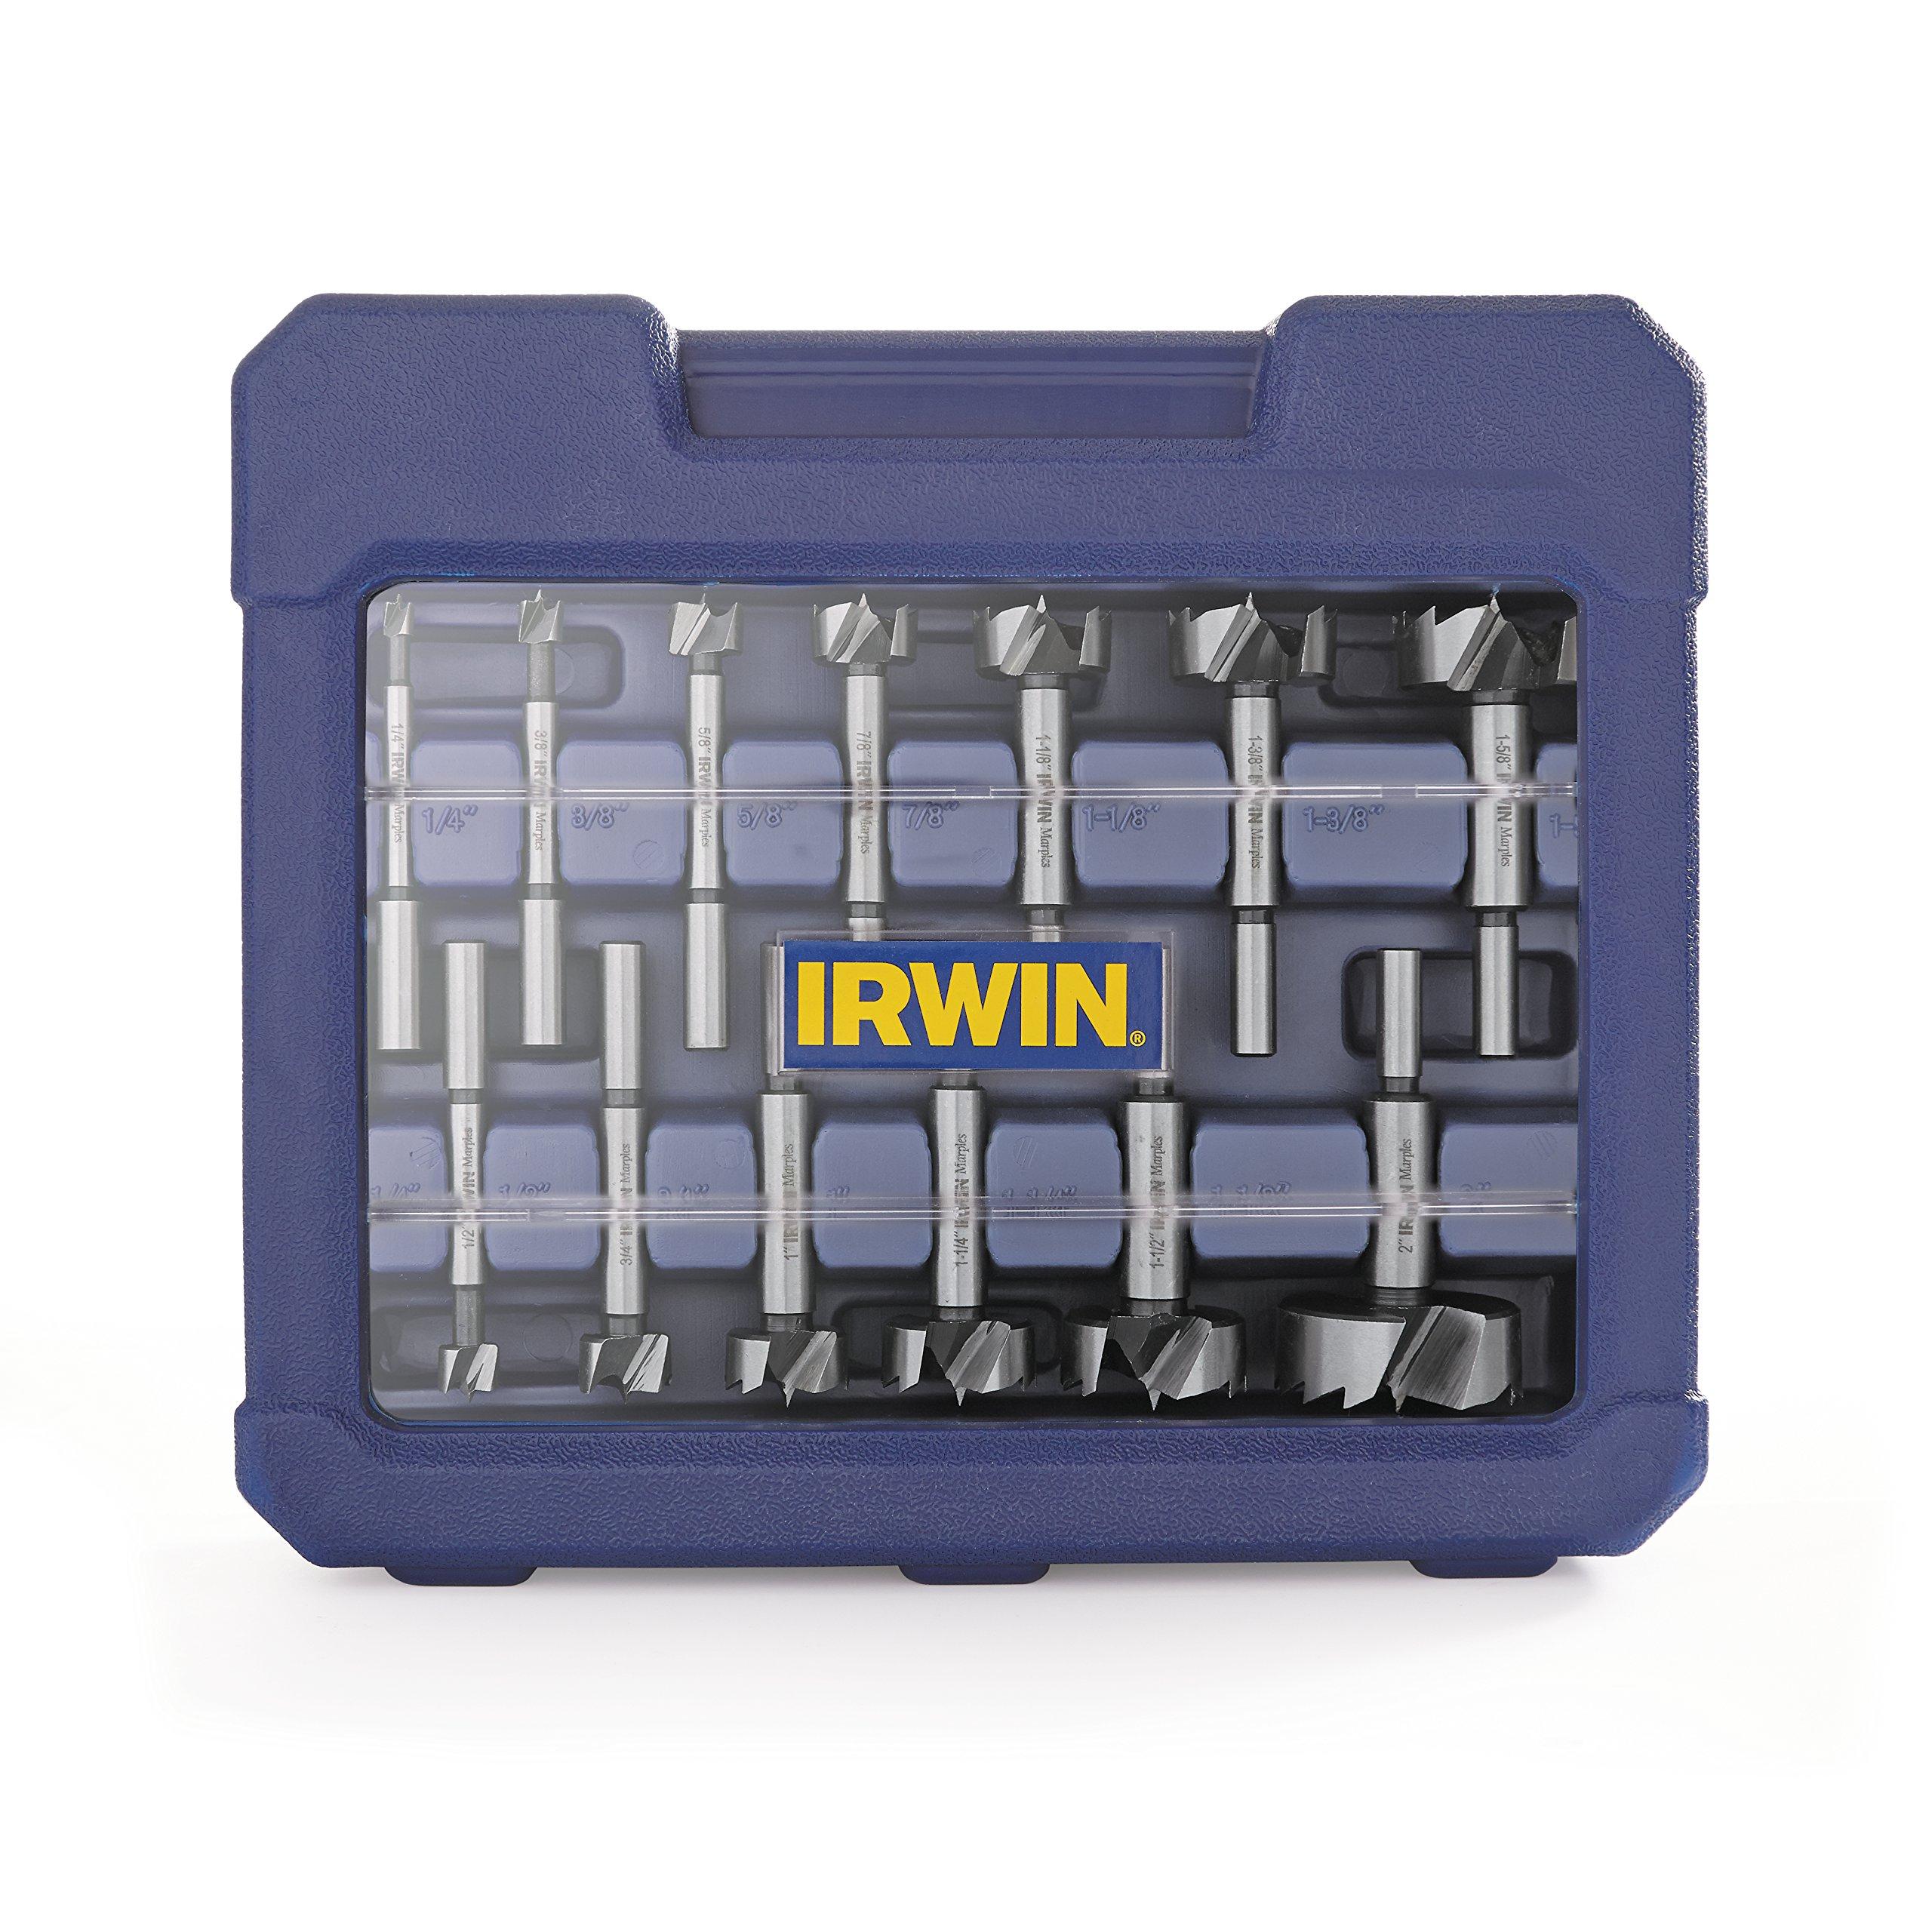 Irwin Tools 1966893 Marples Wood Drilling Forstner Bit Set (14 Piece)